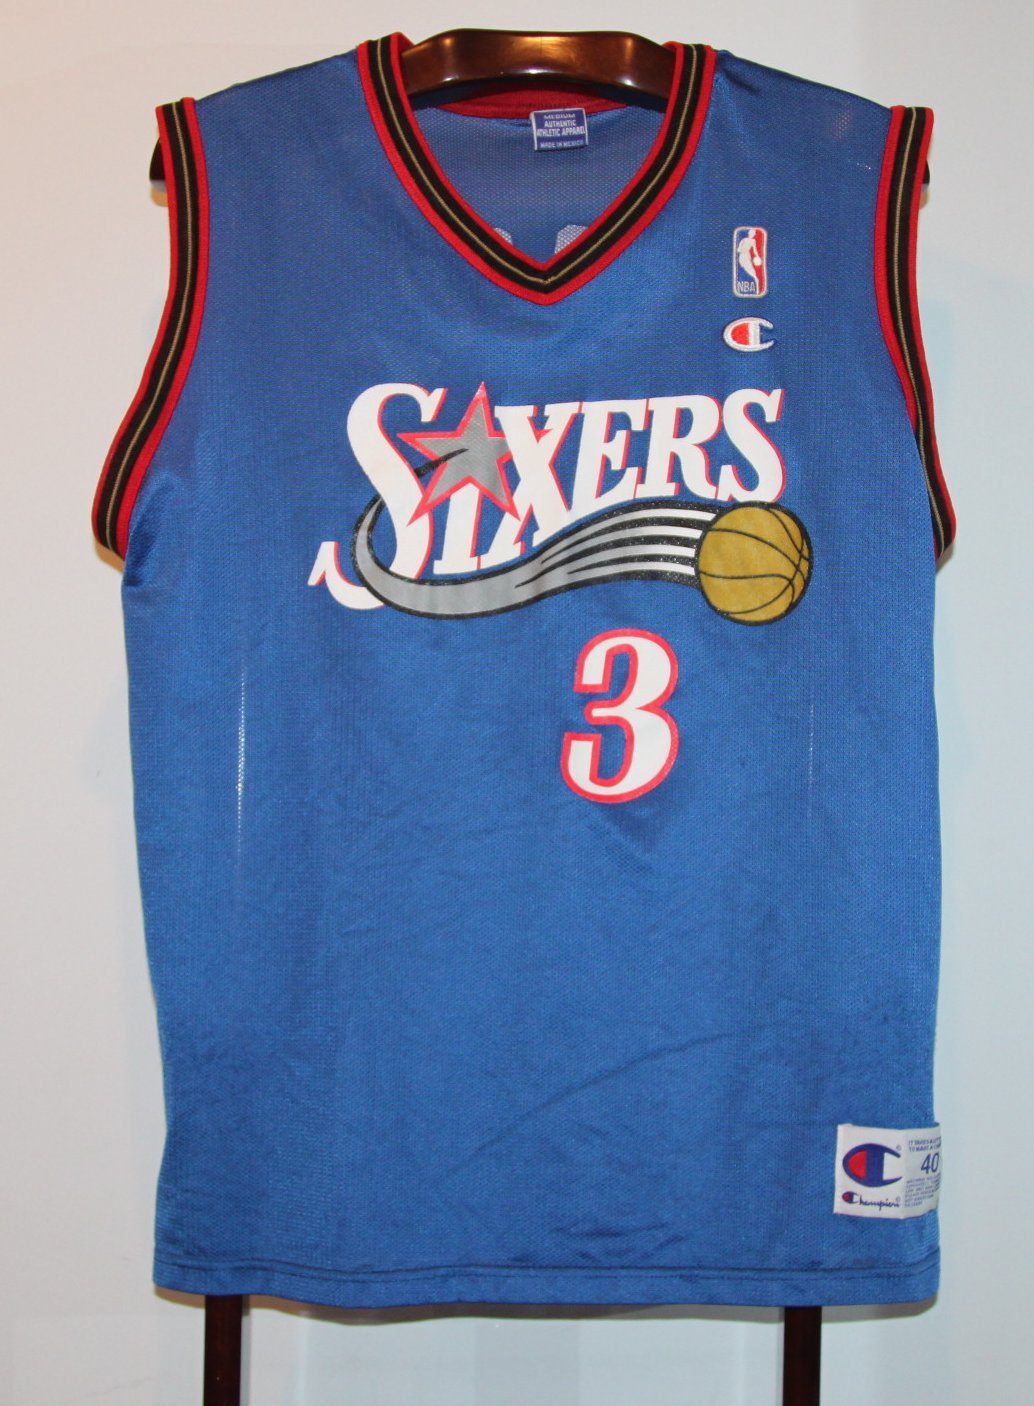 Trikot Jersey-Camiseta de baloncesto, diseño de baloncesto Nba Philadelphia 76ers Allen Iverson M: Amazon.es: Deportes y aire libre